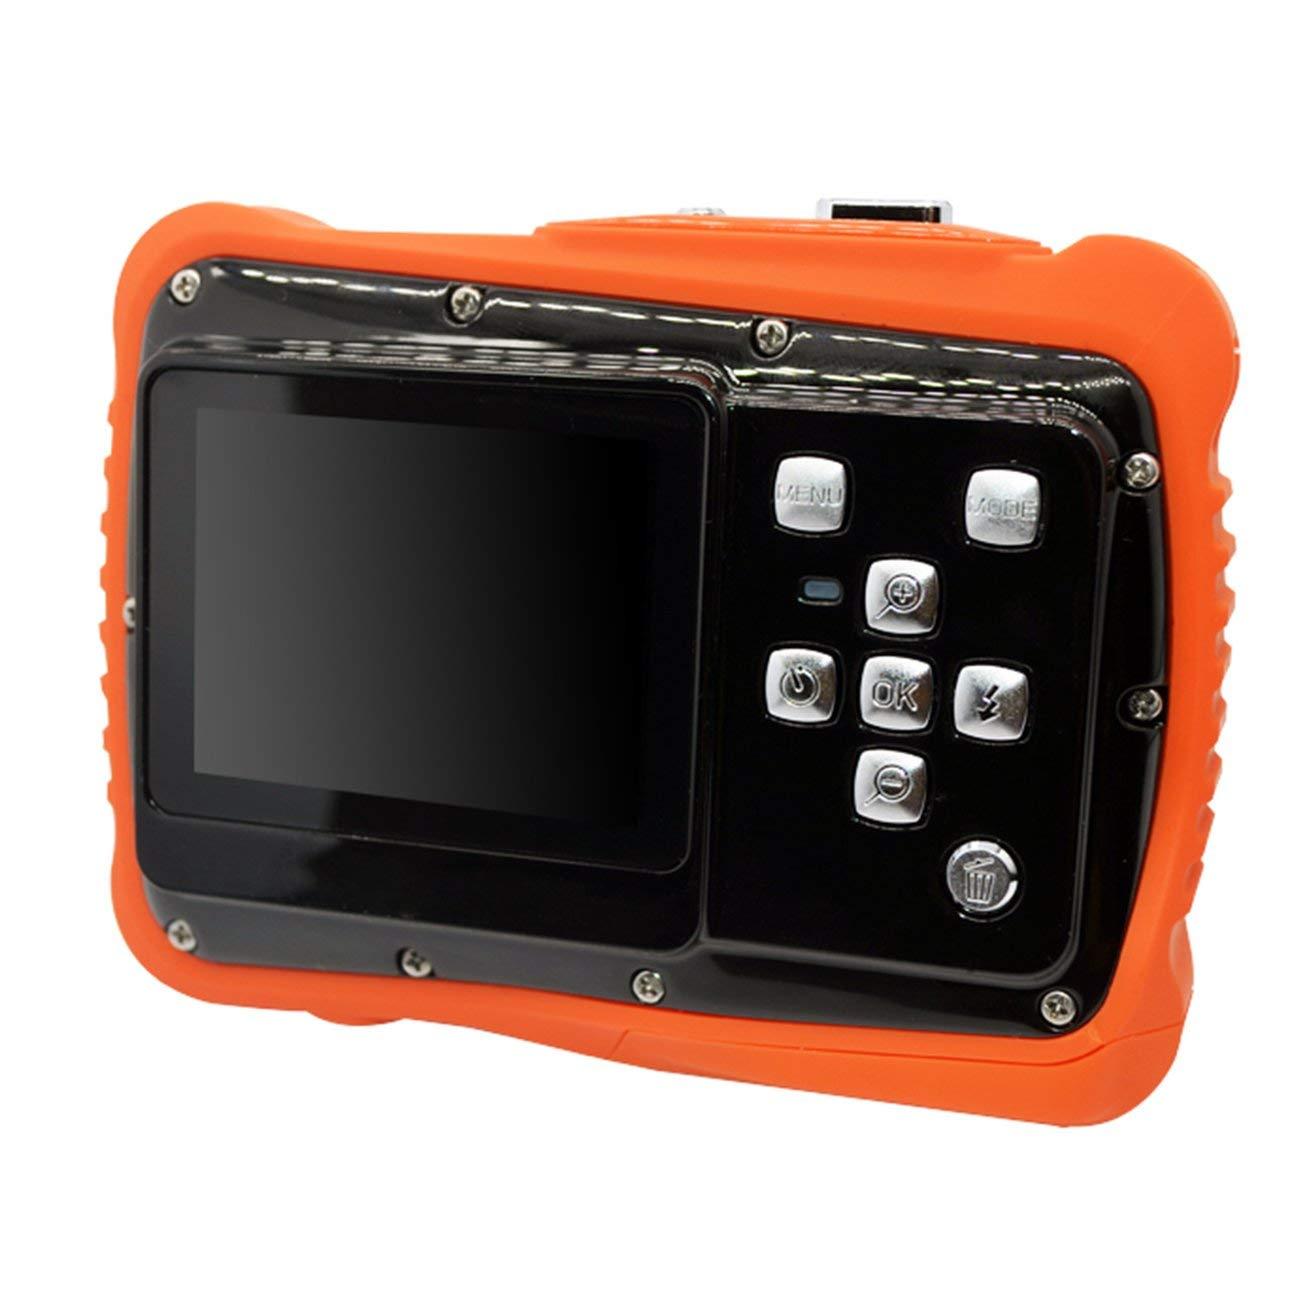 Ballylelly 2 Zoll-5M Zoll-5M Zoll-5M 720P Minikamera Digitalkamera für Kinder Baby-Nette Karikatur-Geschenk b5759d